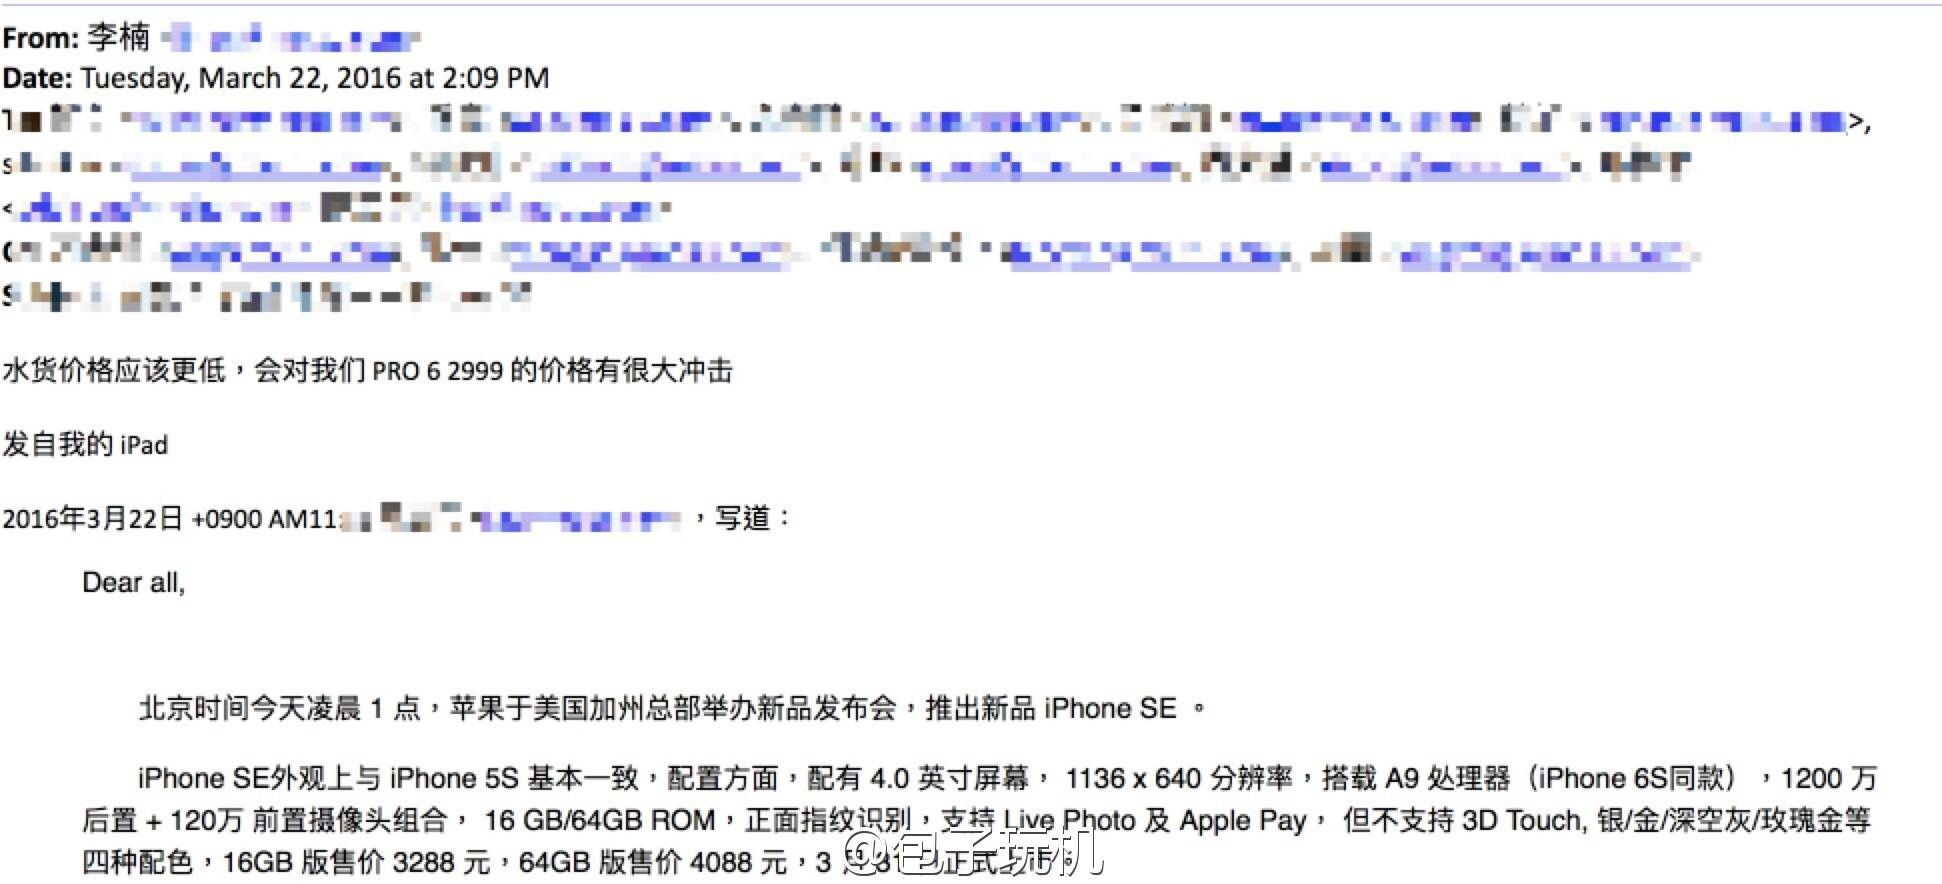 Meizu Pro 6は2999元で販売されるかも?副総裁のメールがリーク